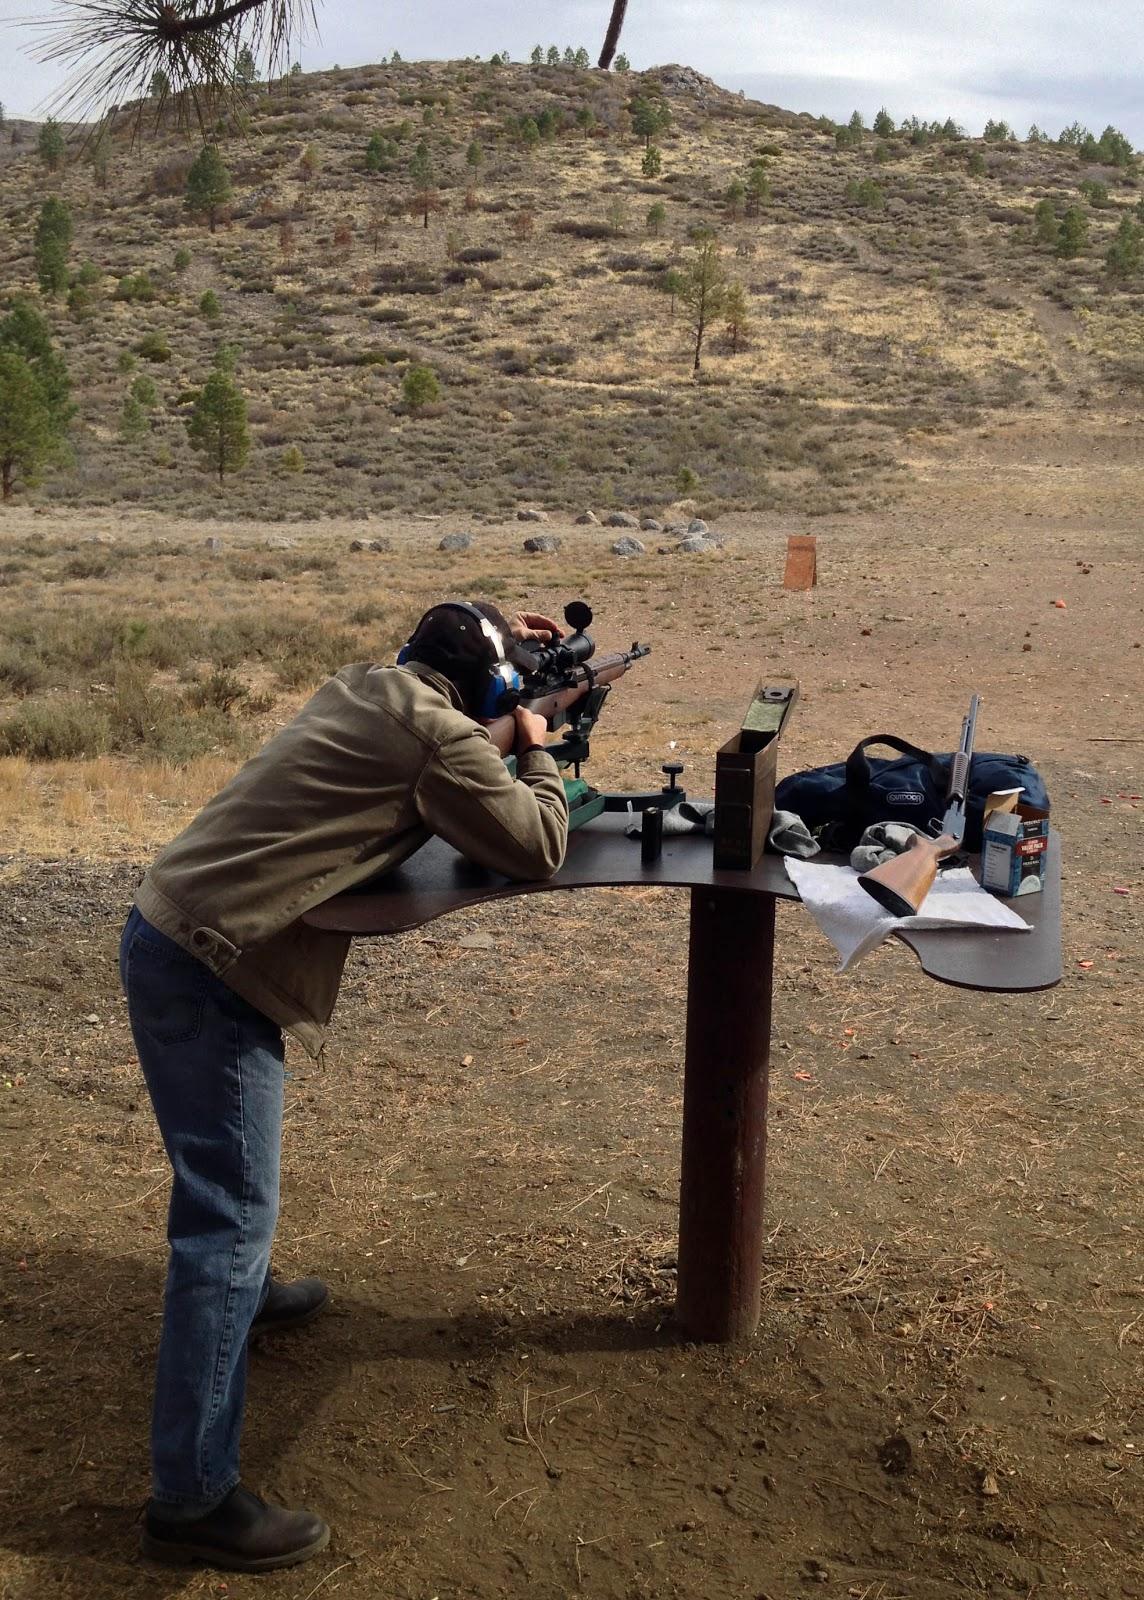 Tahoe Truckee Outdoor Target Shooting